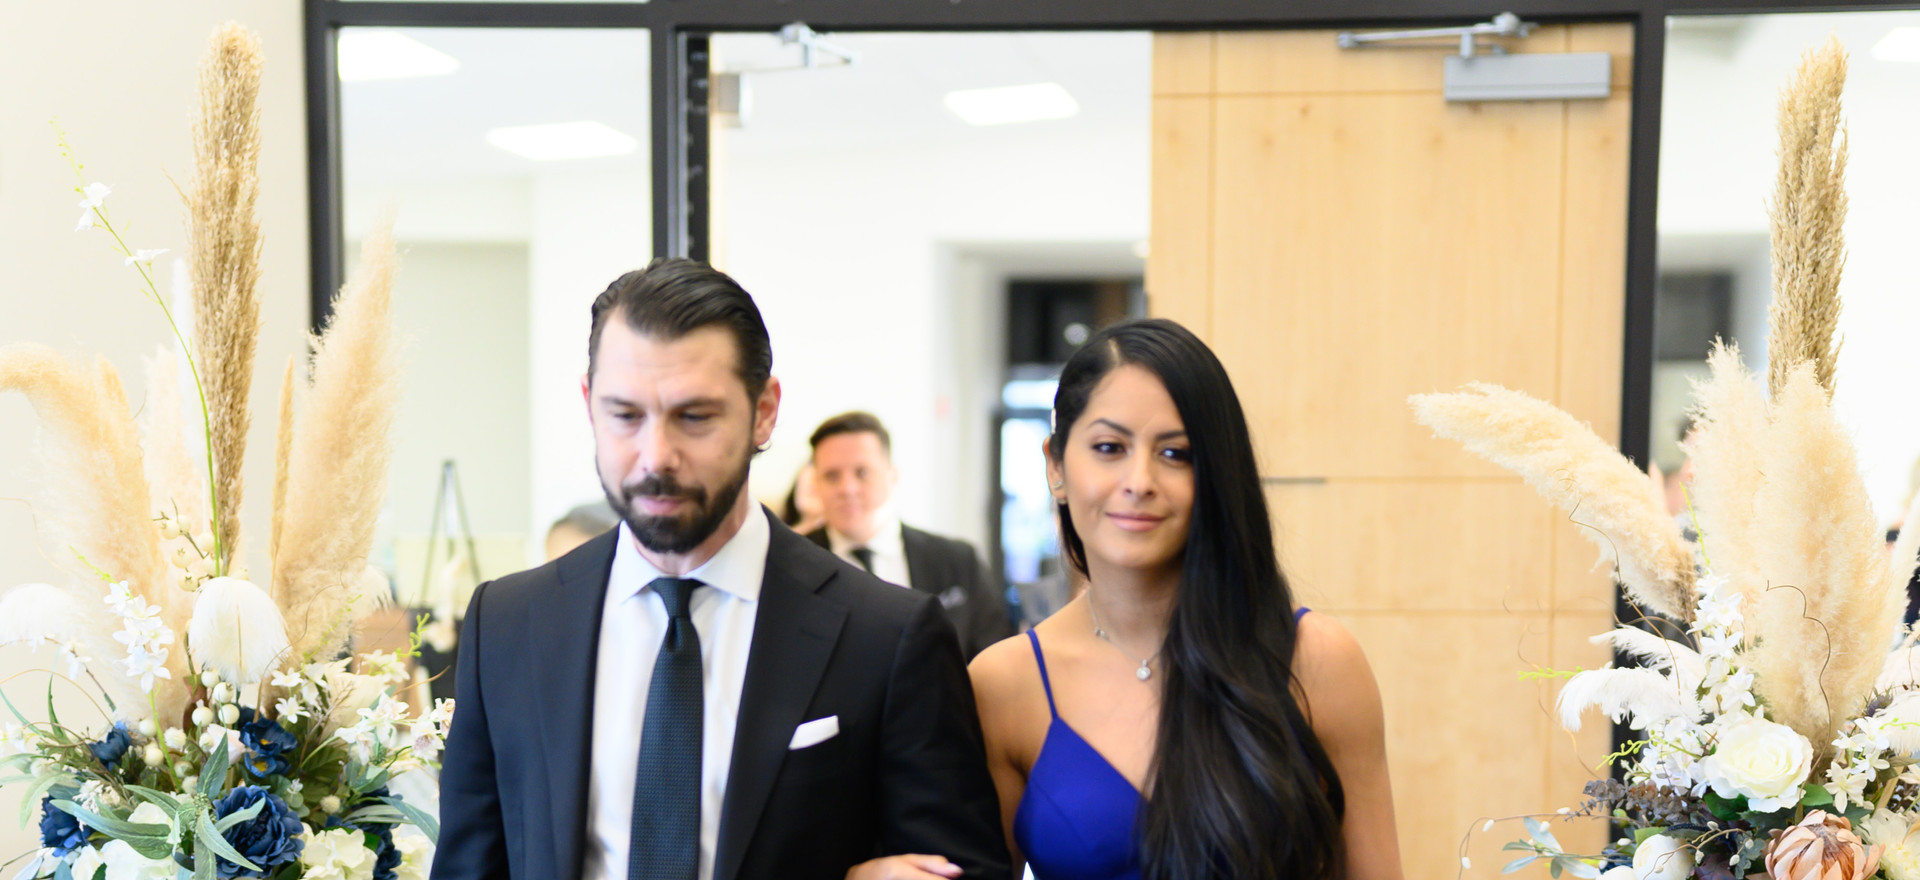 044_Lorena and Mike's Wedding day.jpg